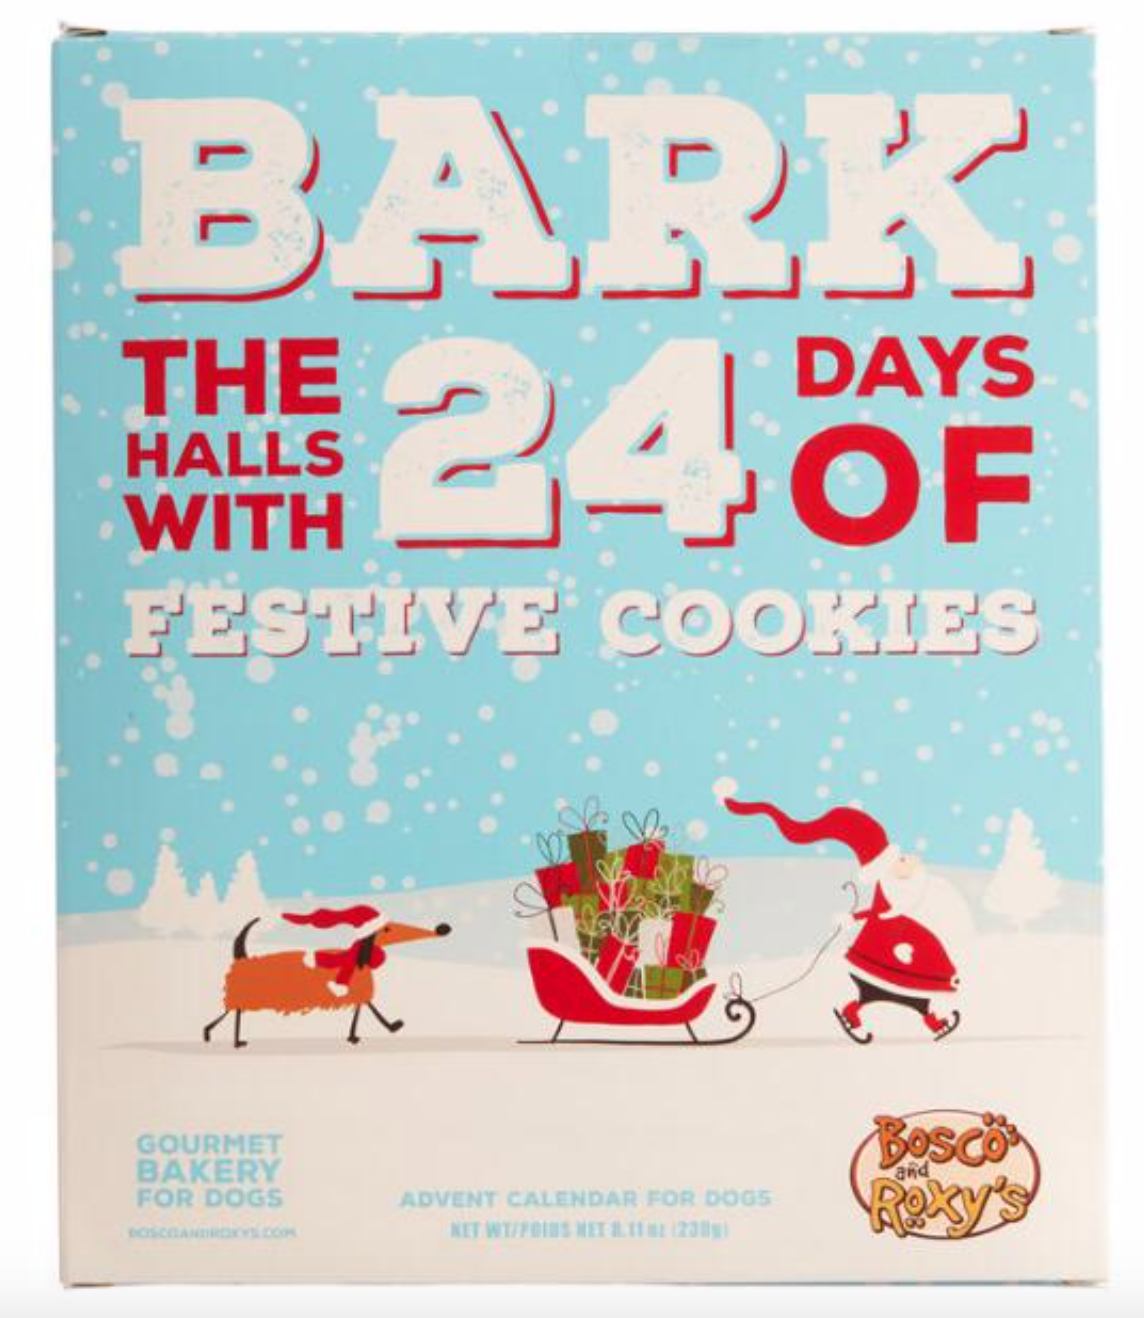 Bosco & Roxy's Bark The Halls Dog Treat Advent Calendar!